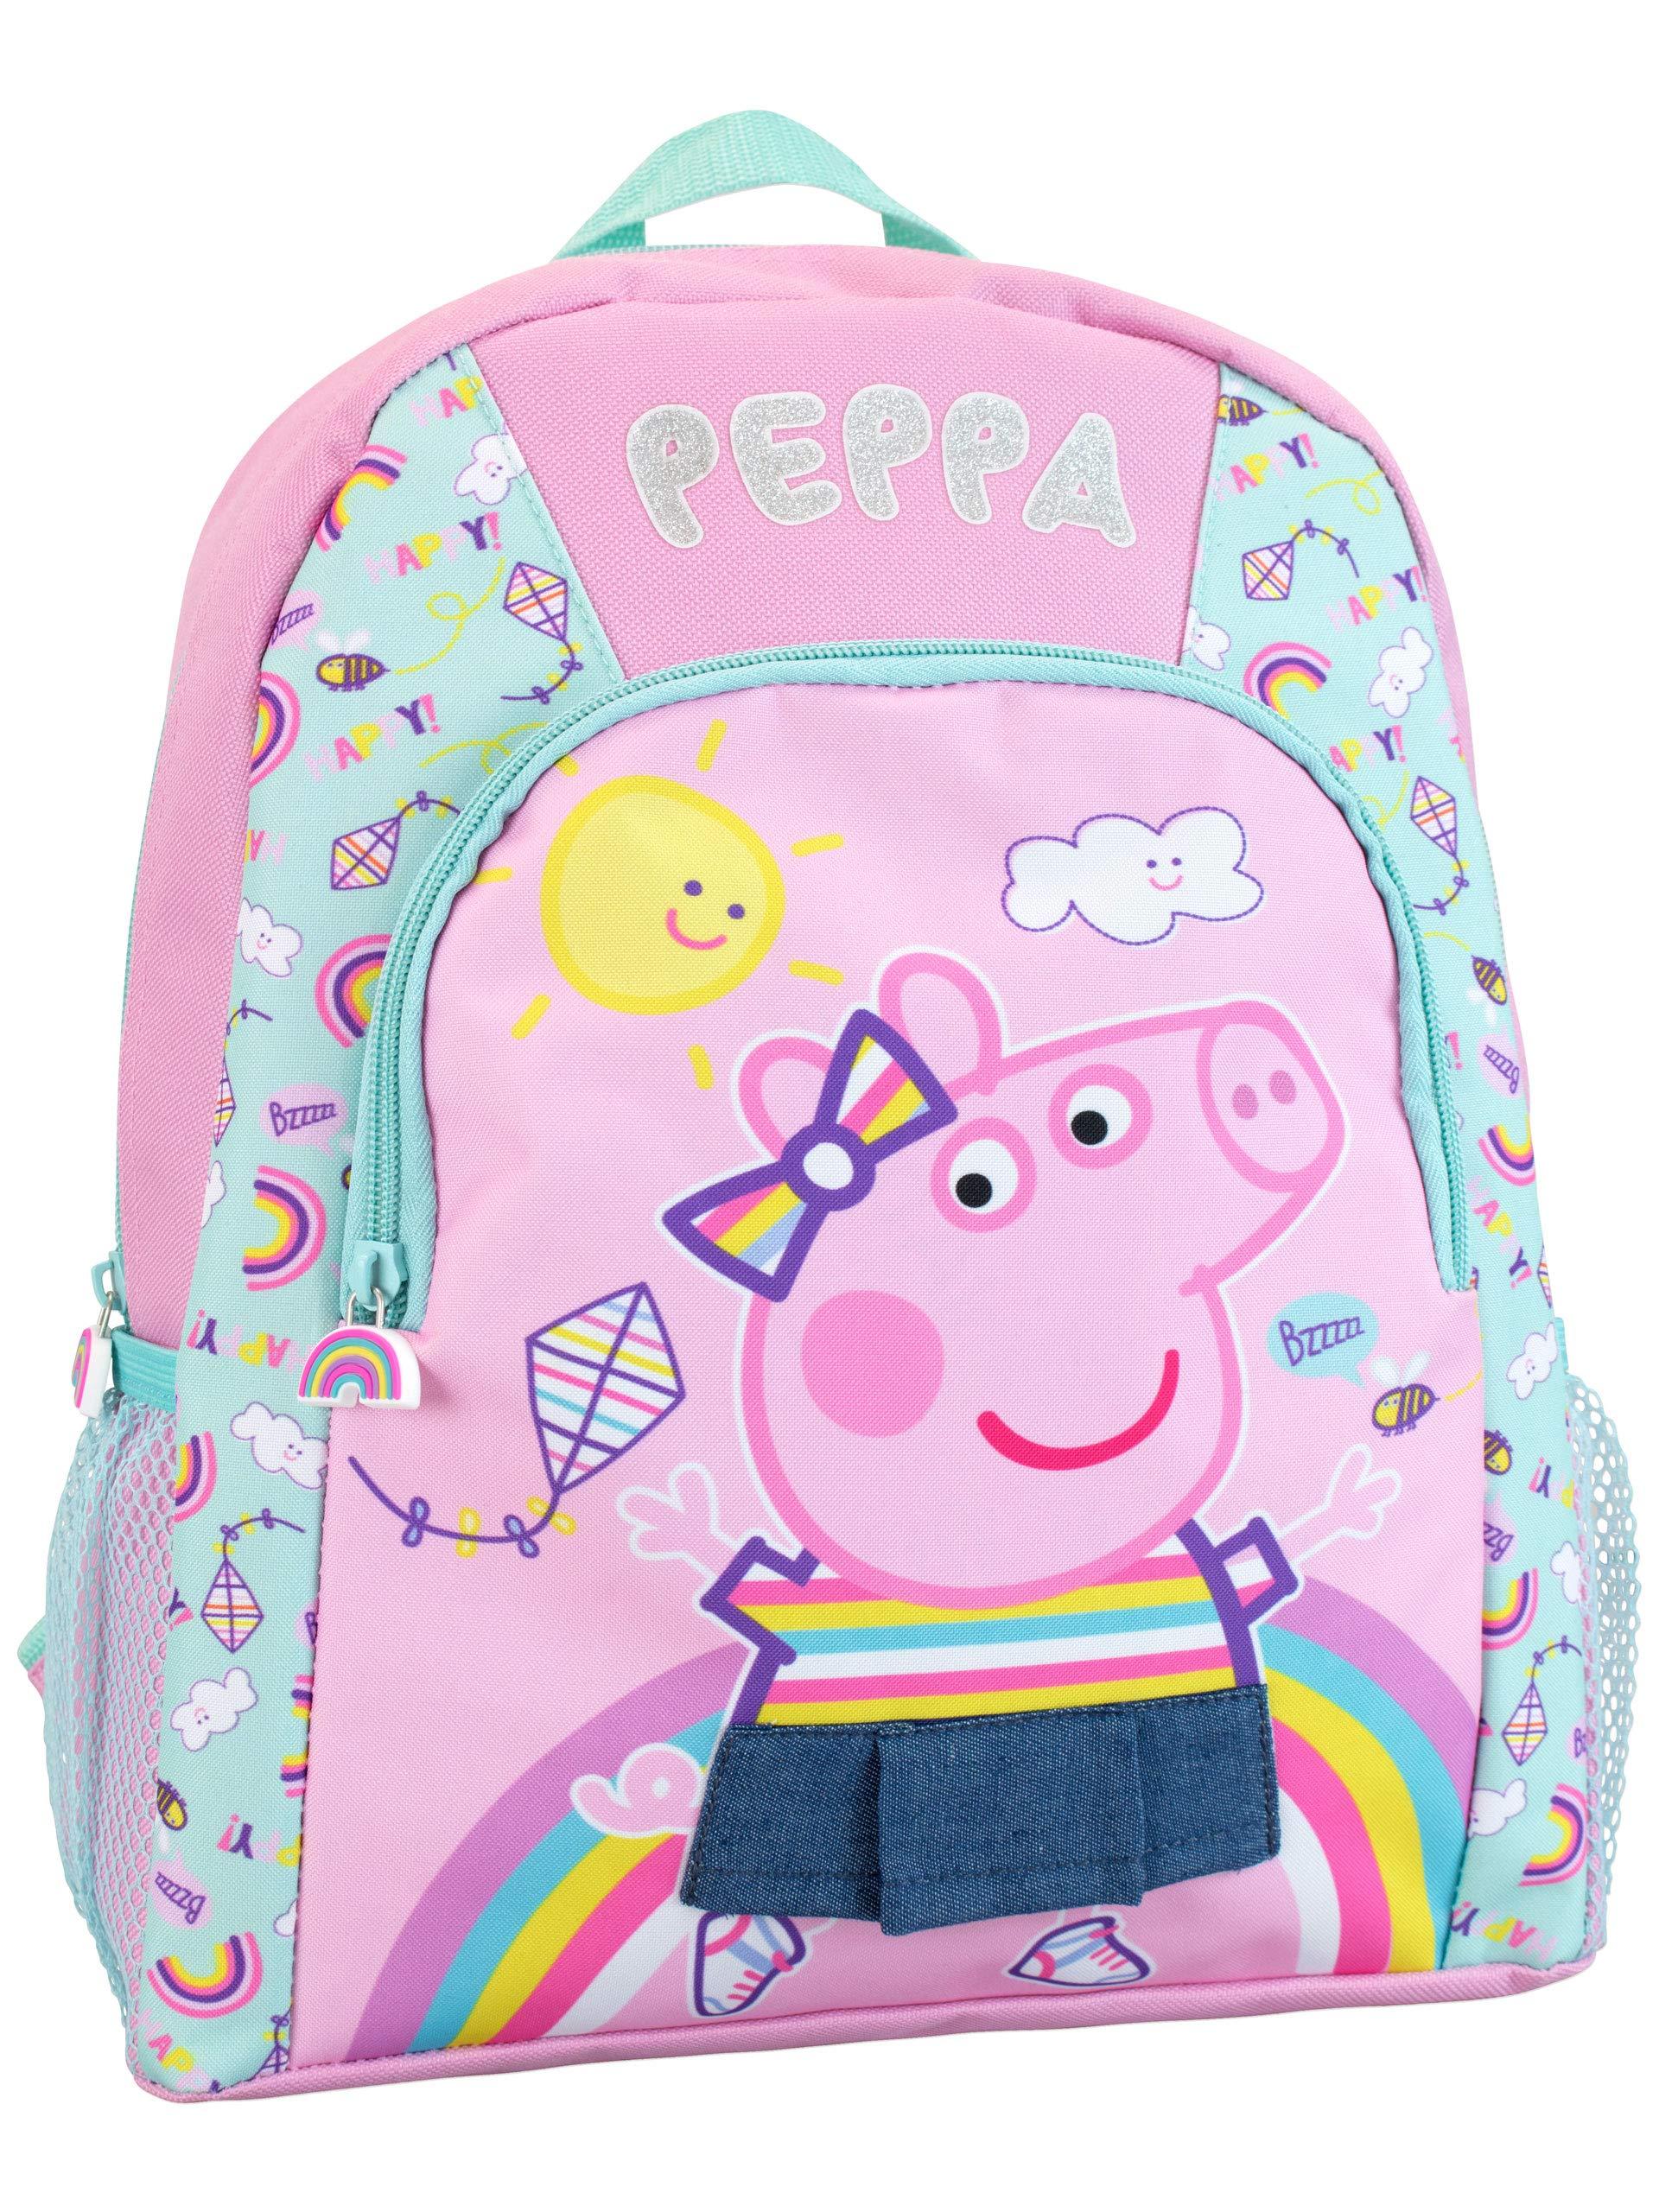 Peppa Pig Kids Backpack